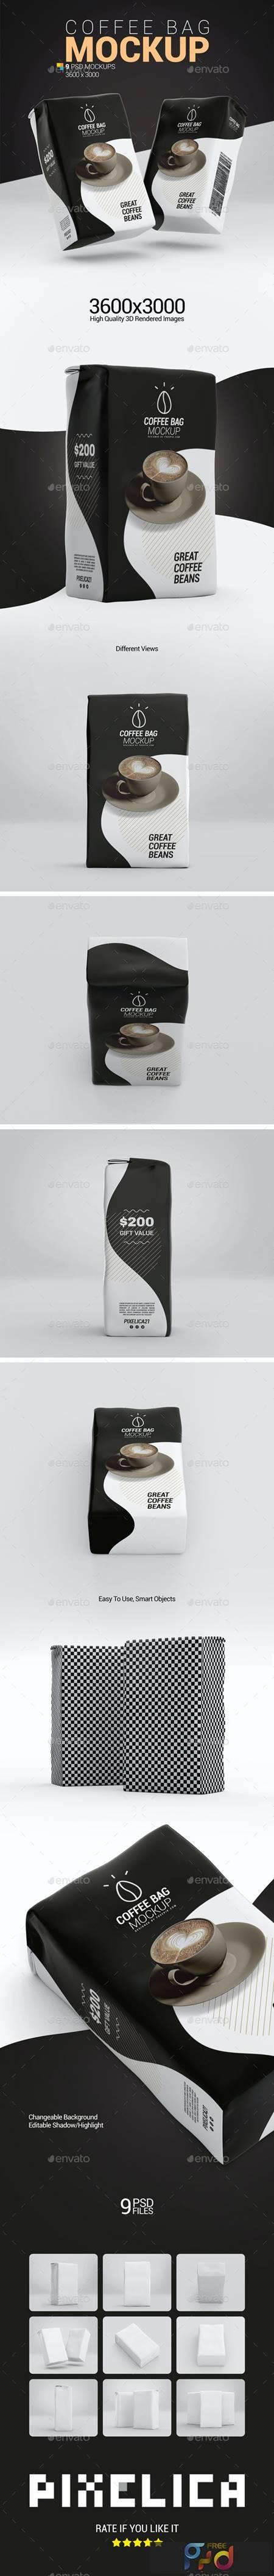 Coffee Paper Bag Mockup 26114957 1